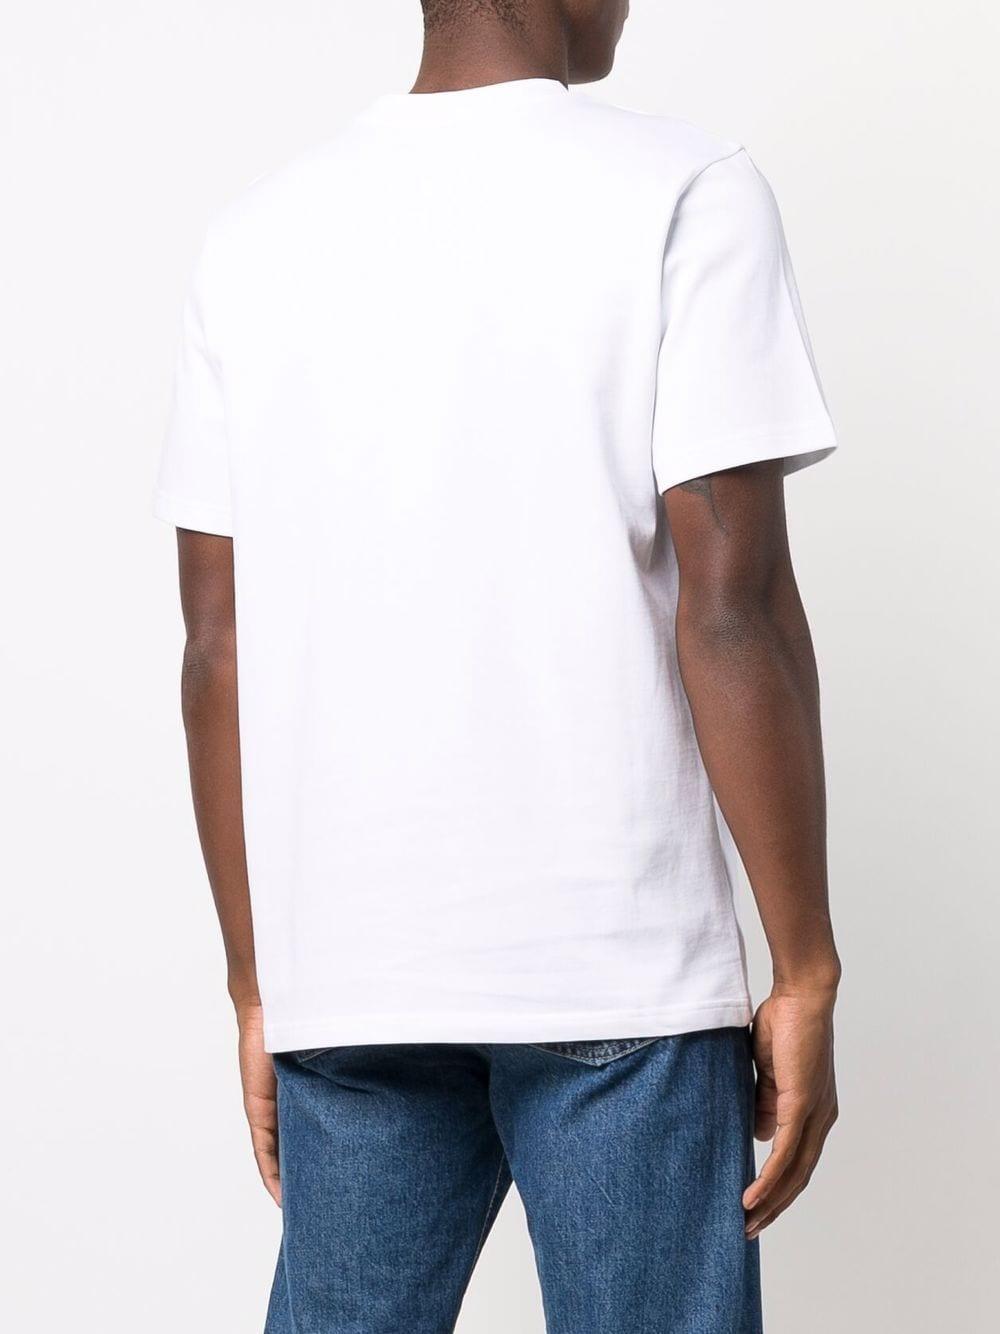 t-shirt white casa club uomo bianca in cotone organico CASABLANCA   T-shirt   MF21-TS-001WHITE CASA CLUB